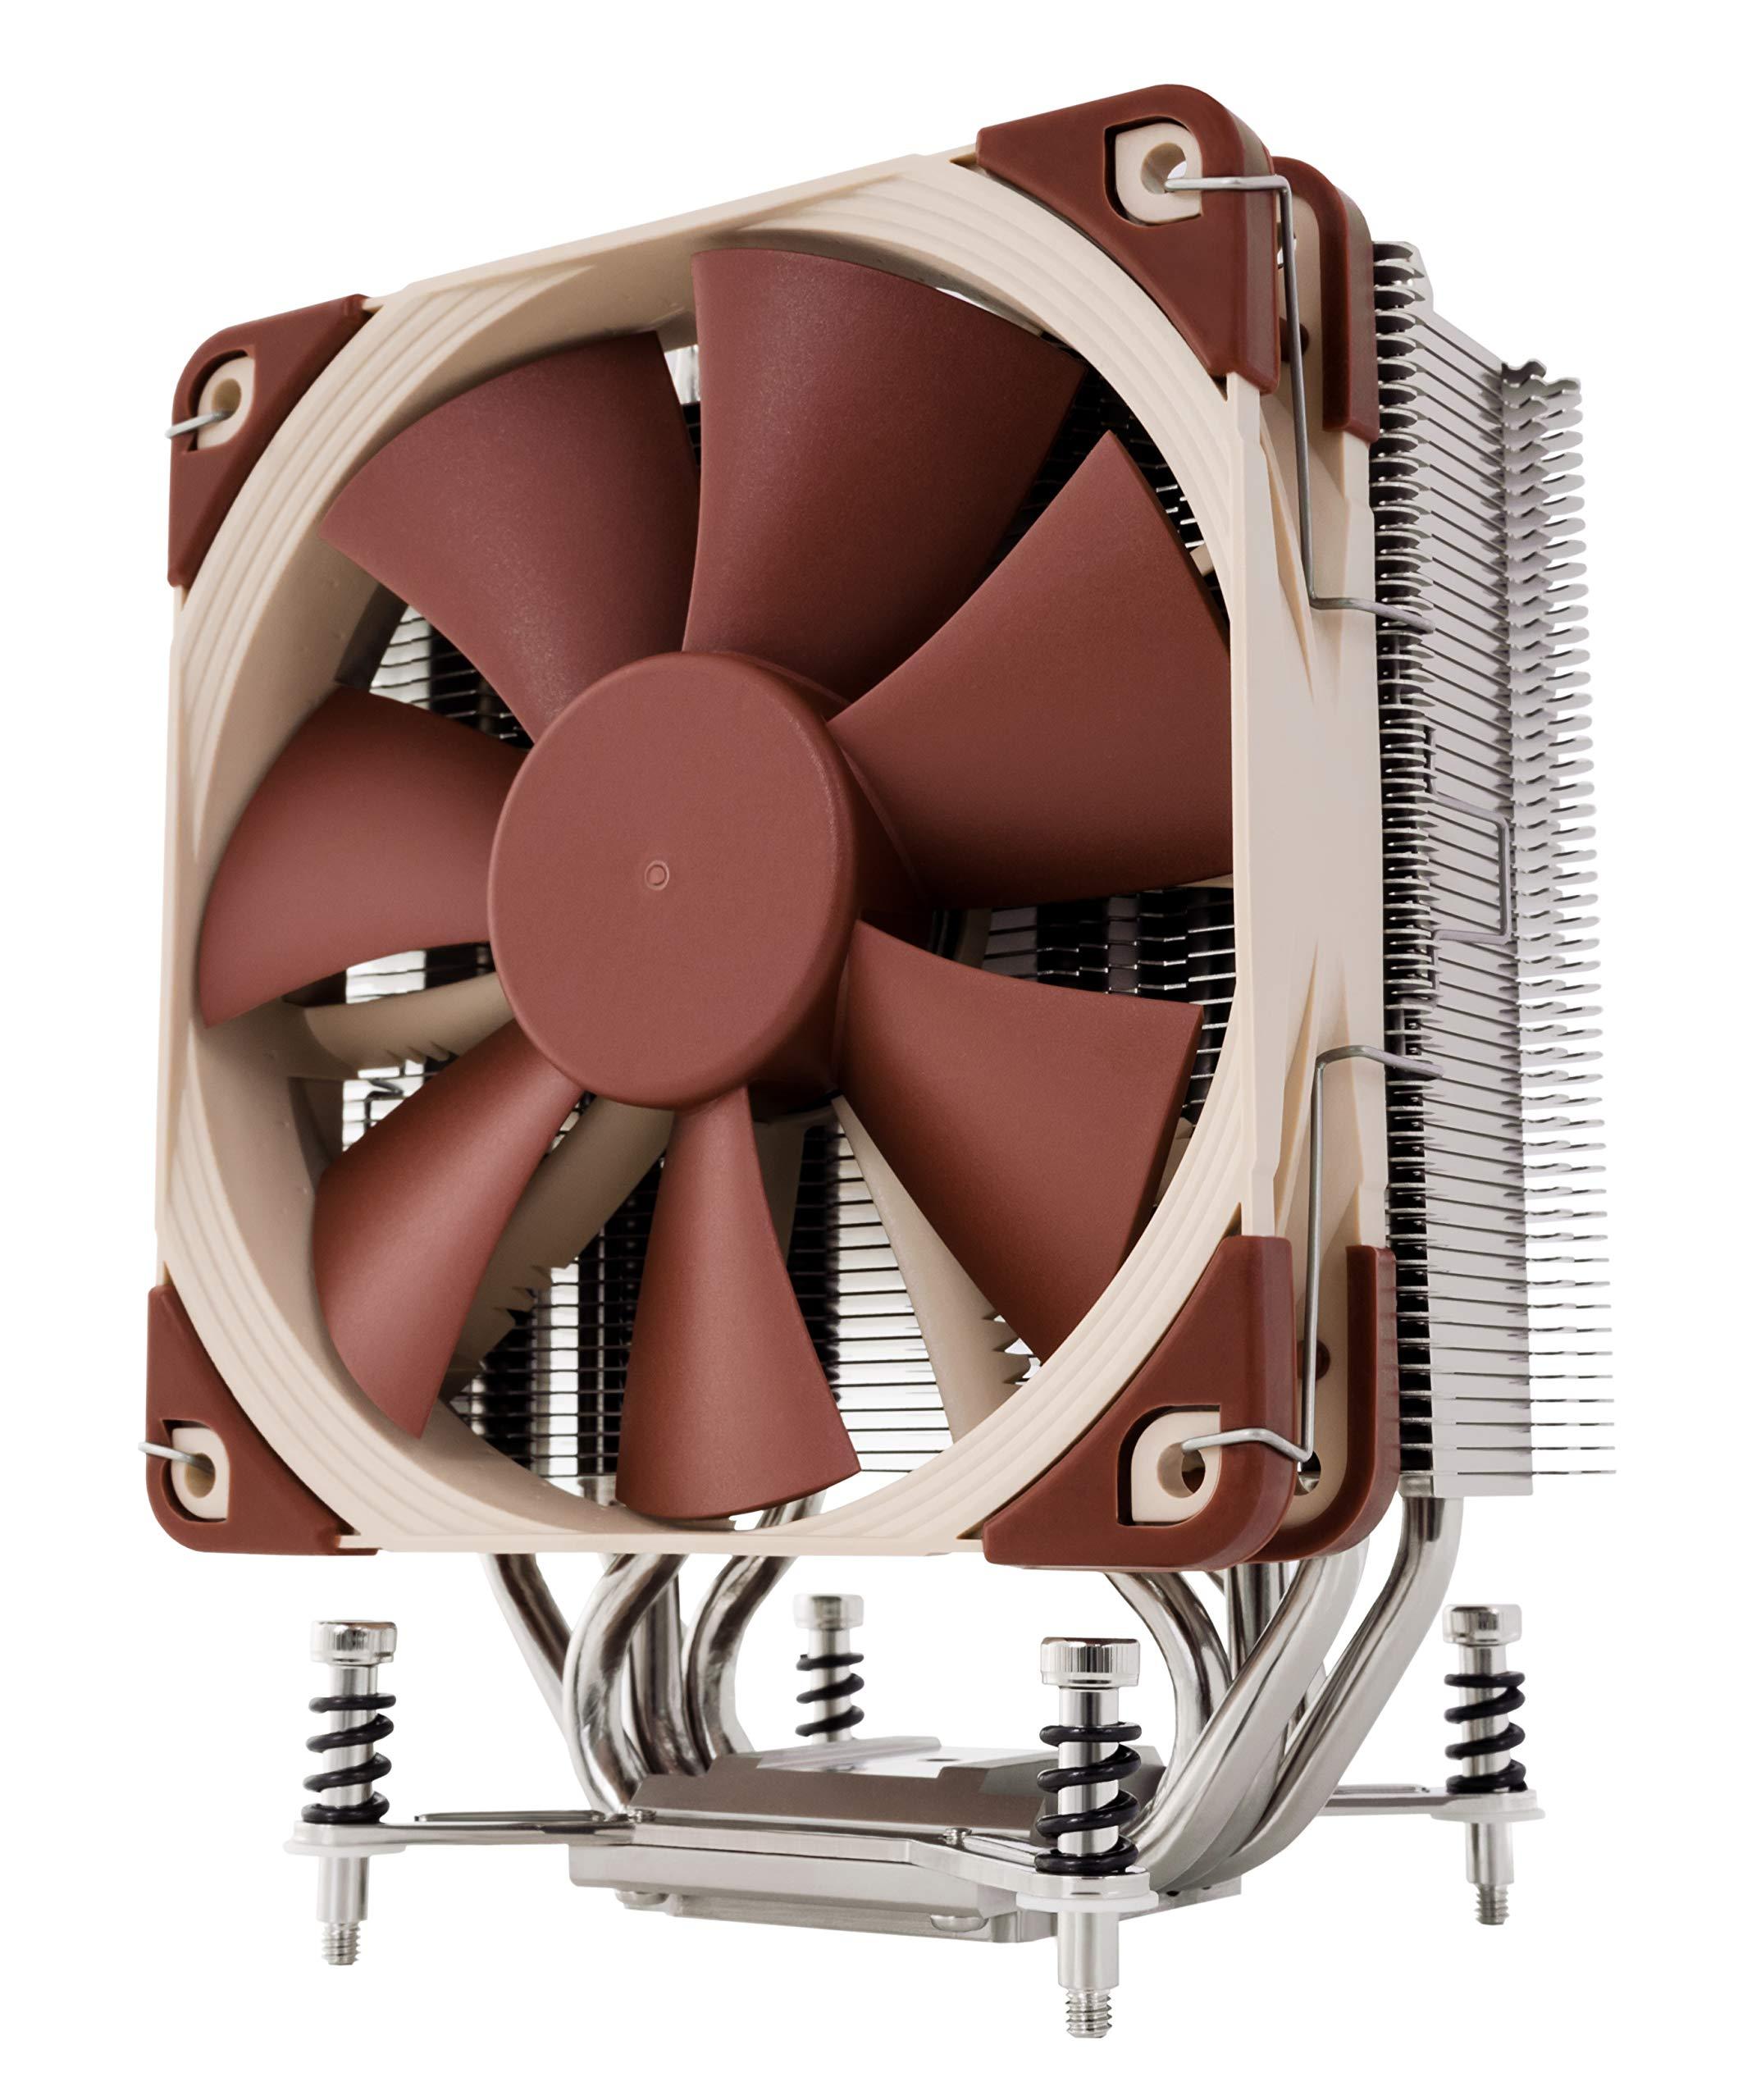 Noctua NH-U12DX i4, Premium CPU Cooler for Intel Xeon LGA20xx (Brown) by NOCTUA